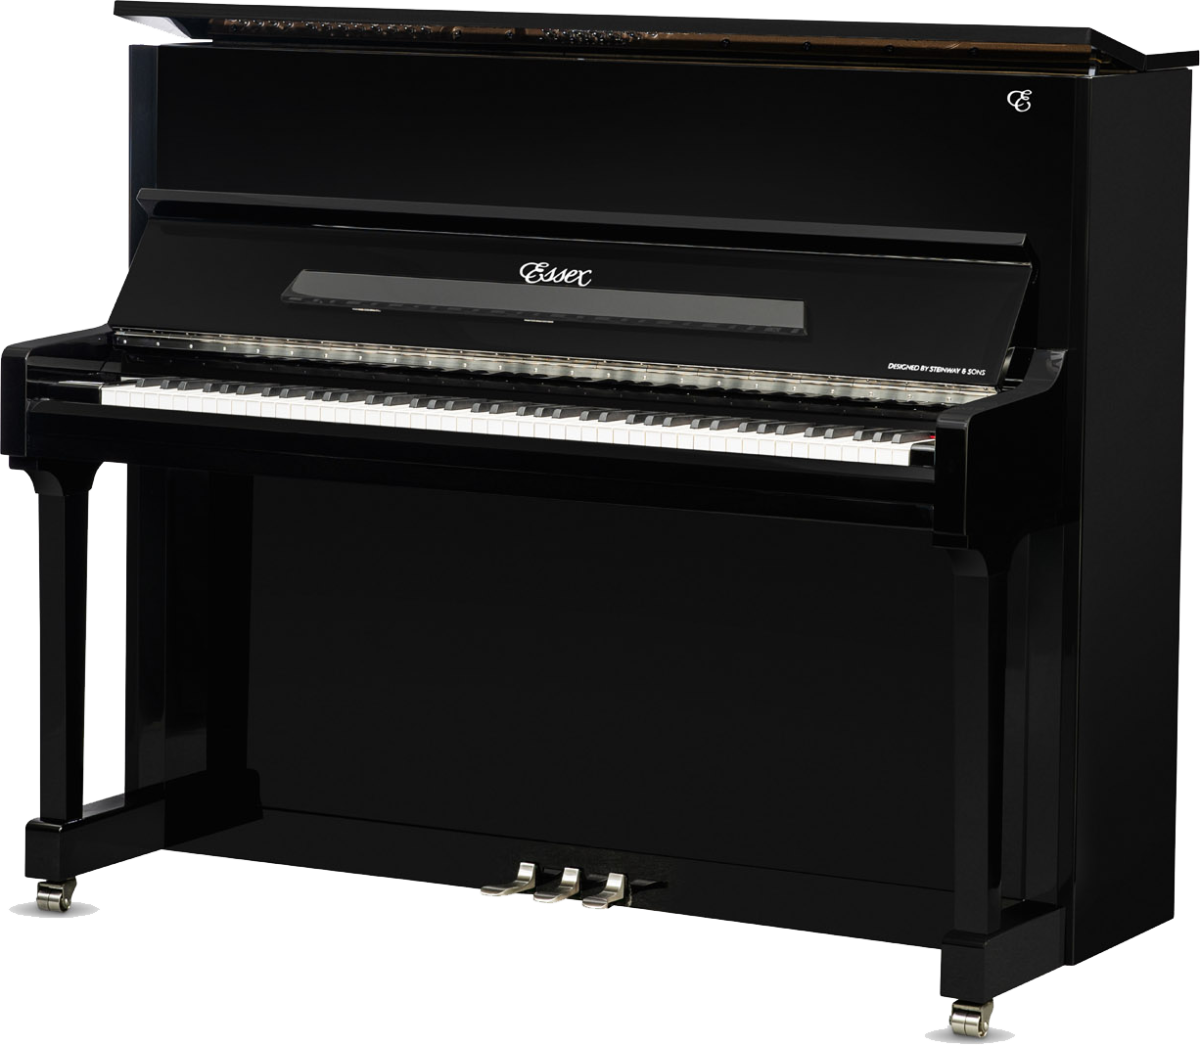 piano-vertical-essex-eup123-chrome-nuevo-negro-plata-frontal-02